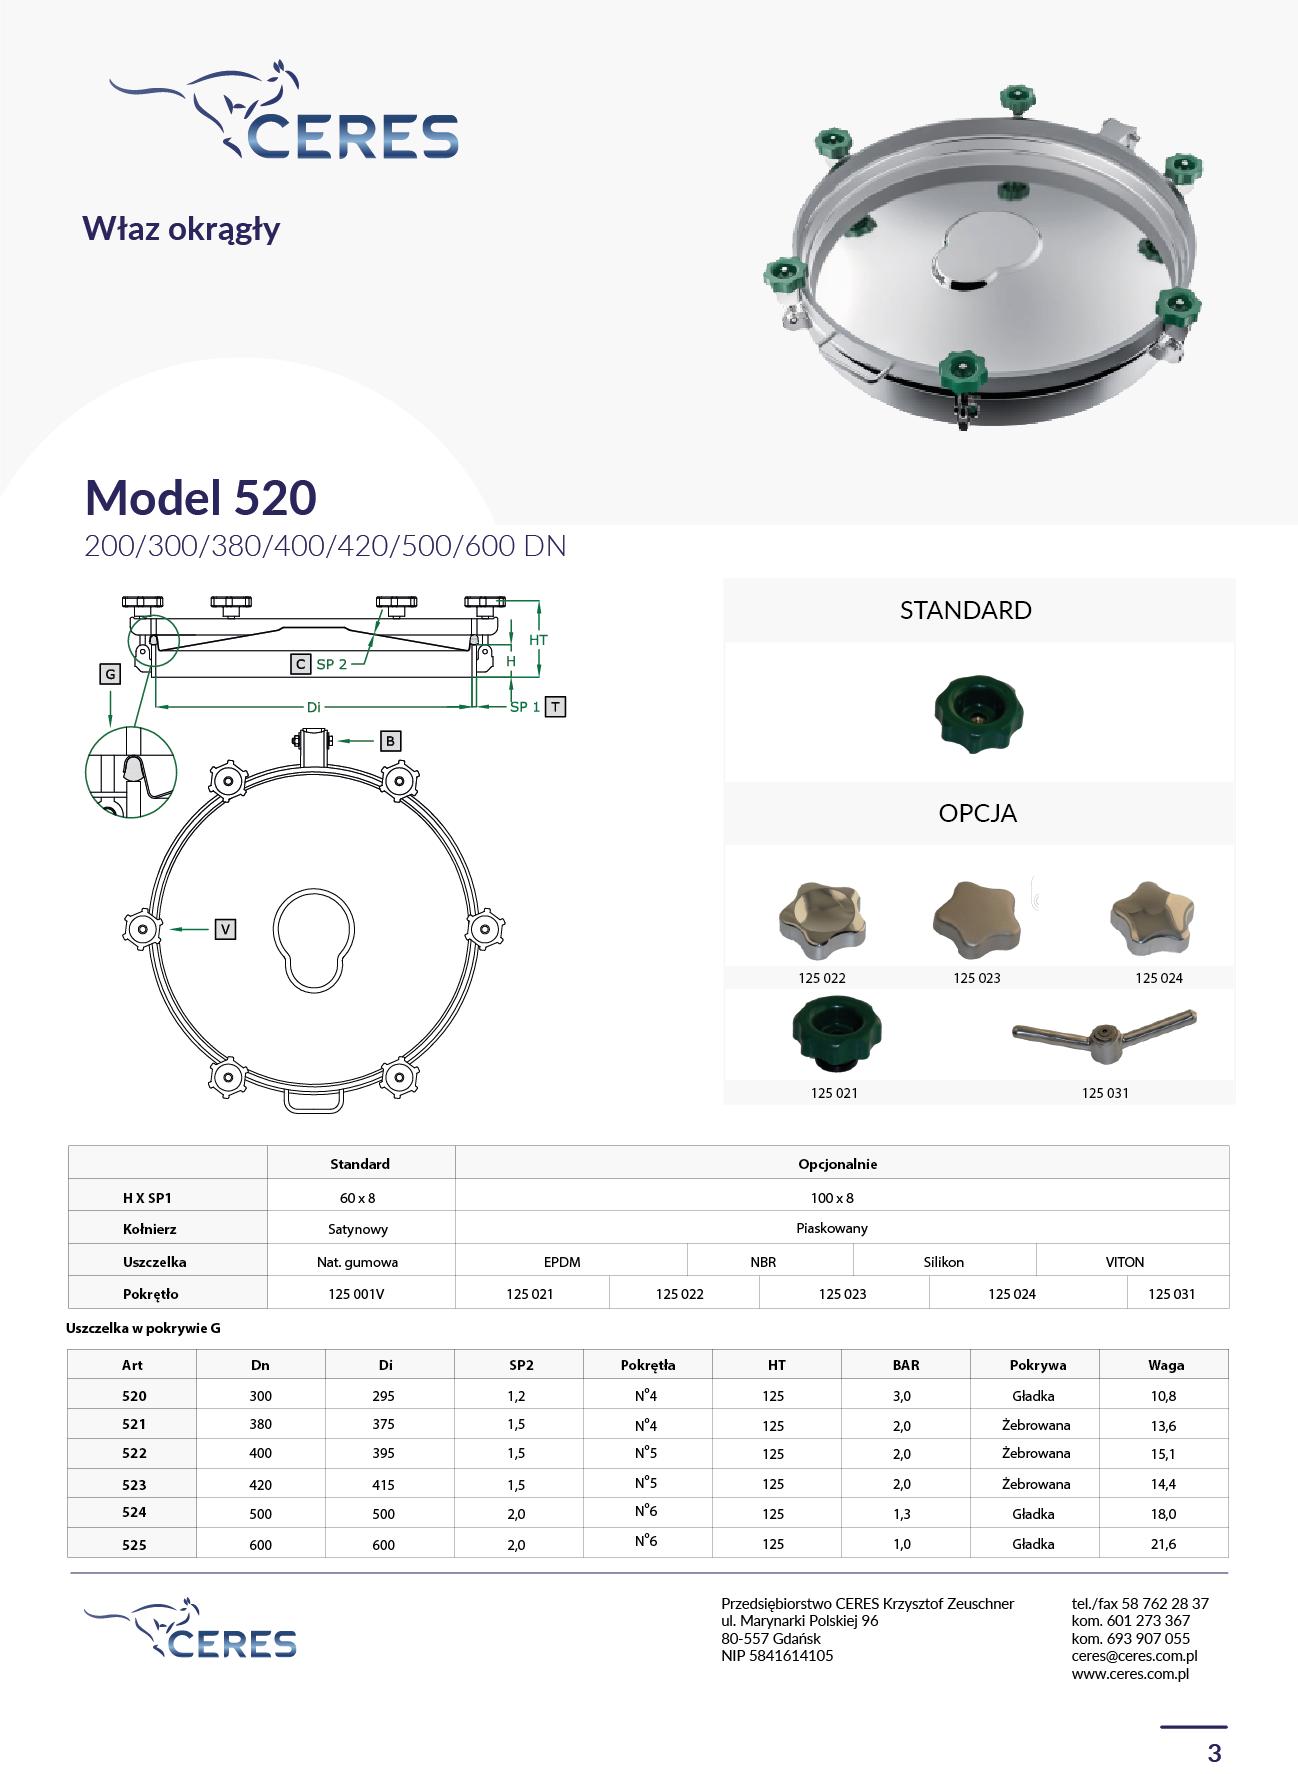 MODEL 520